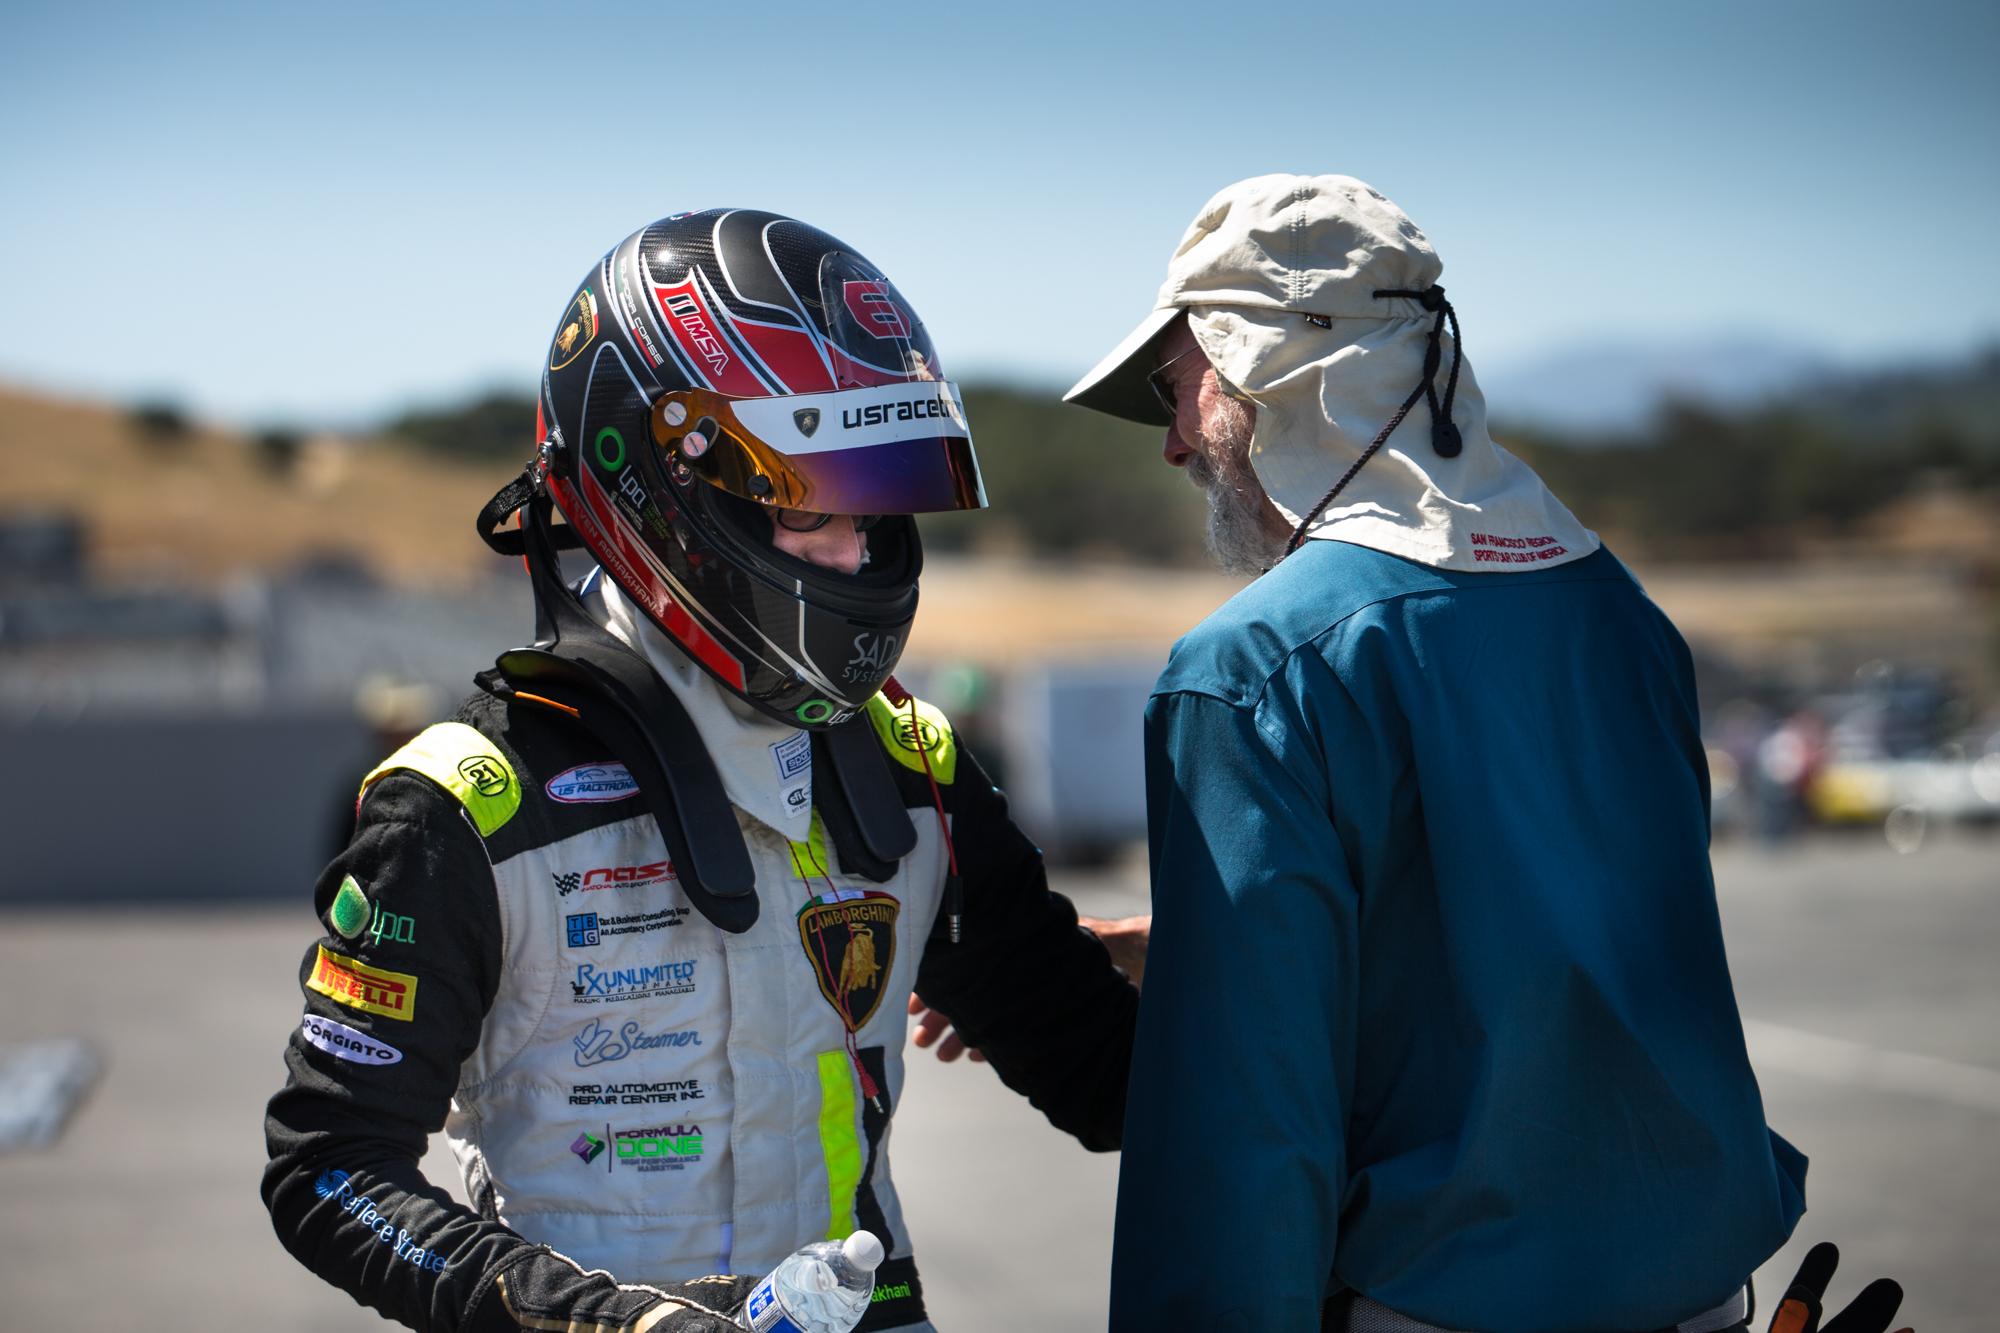 Steven-Racing-Laguna-20180602-96799.jpg